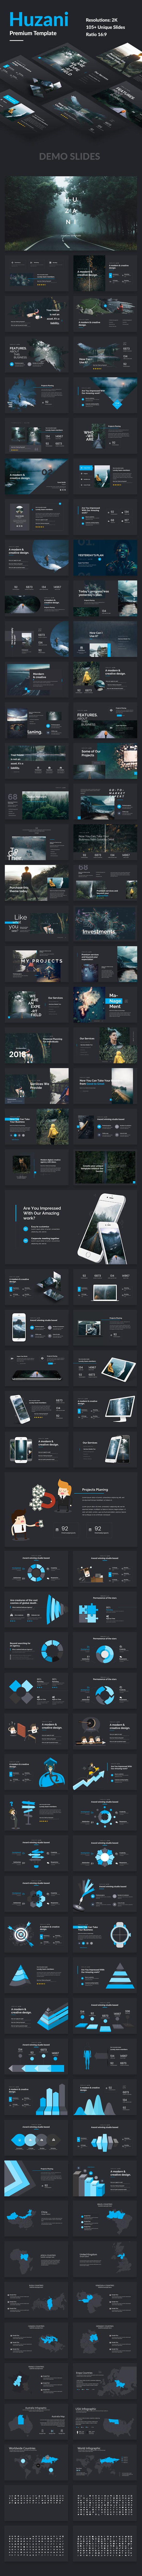 Huzani Premium Design Google Slide Template - Google Slides Presentation Templates